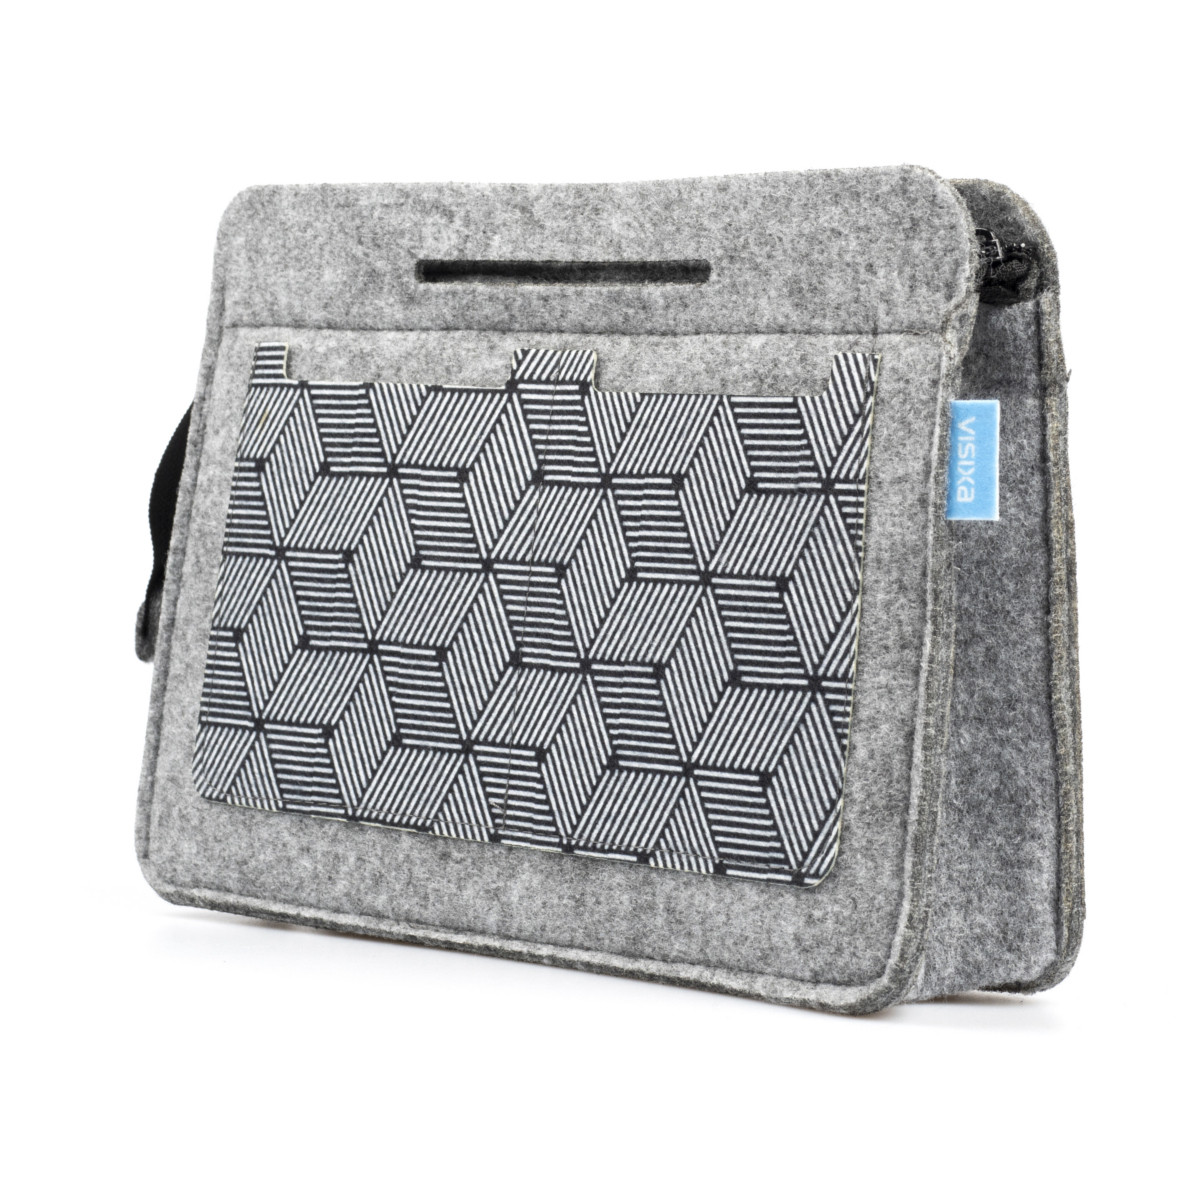 VISIXA Organizér - Cube